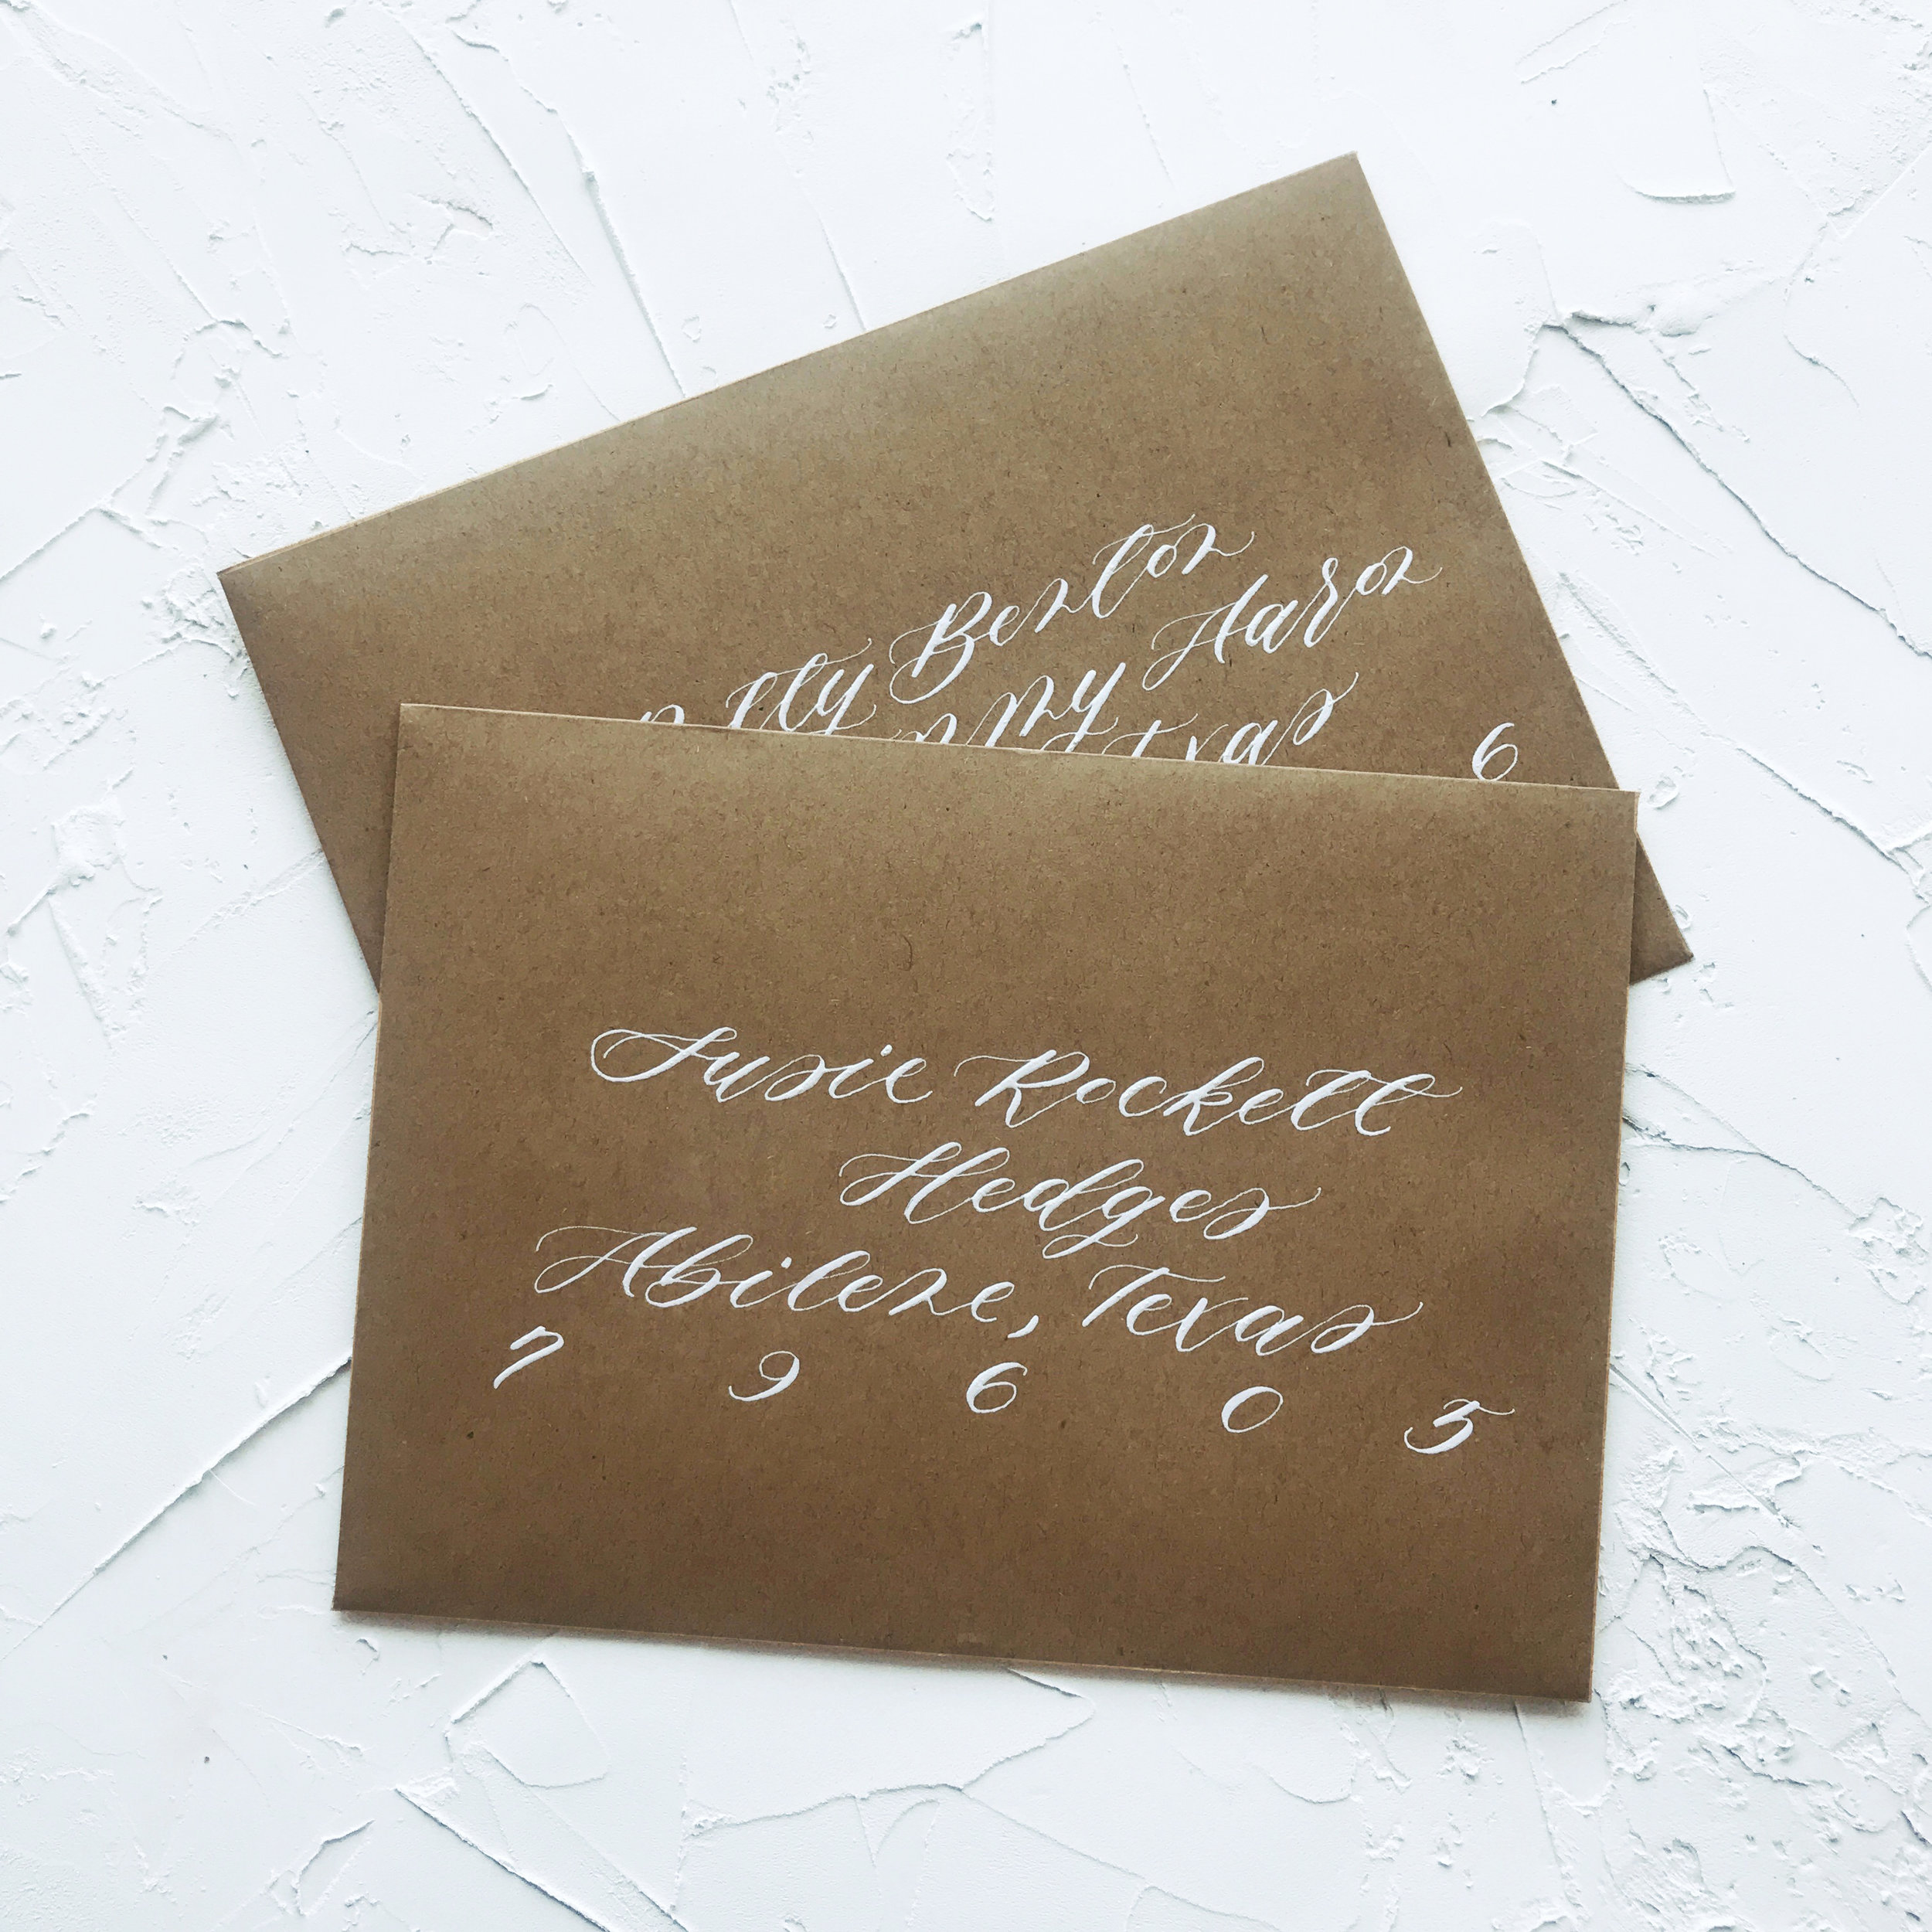 Custom Envelope Calligraphy Addressing | Sojourn Art and Ink